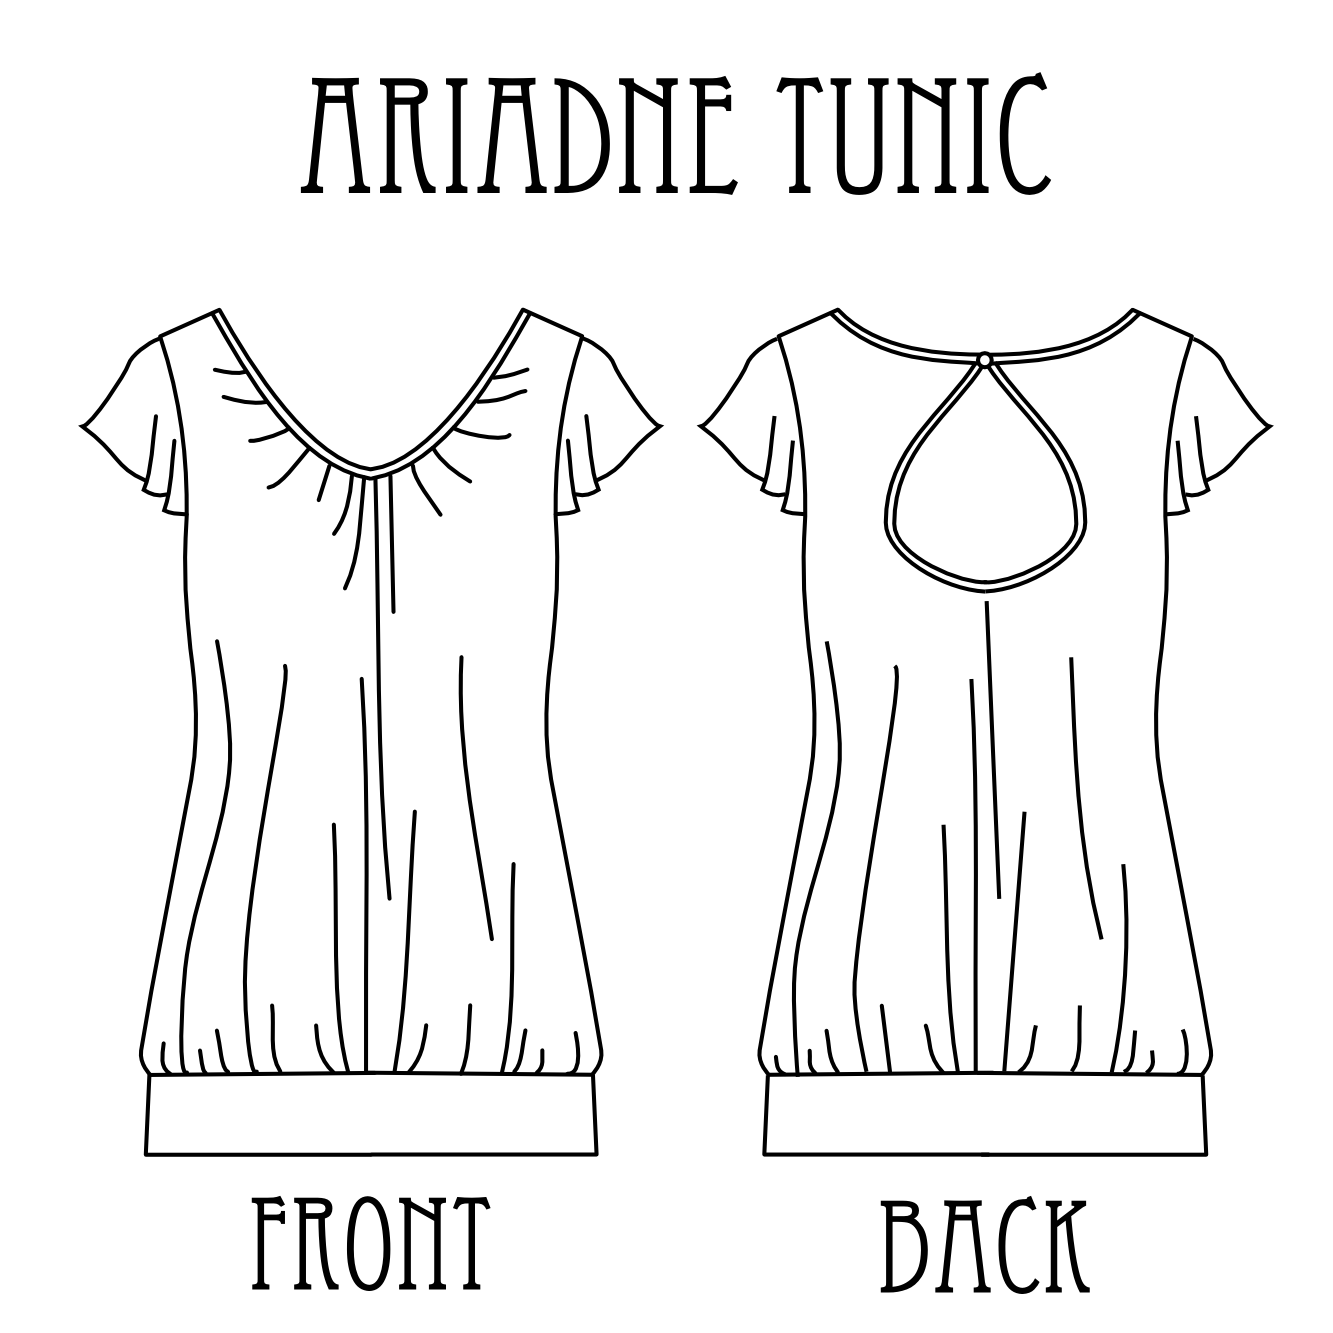 Anleitung und Schnittmuster Ariadne Tunic | Nähen | Pinterest ...